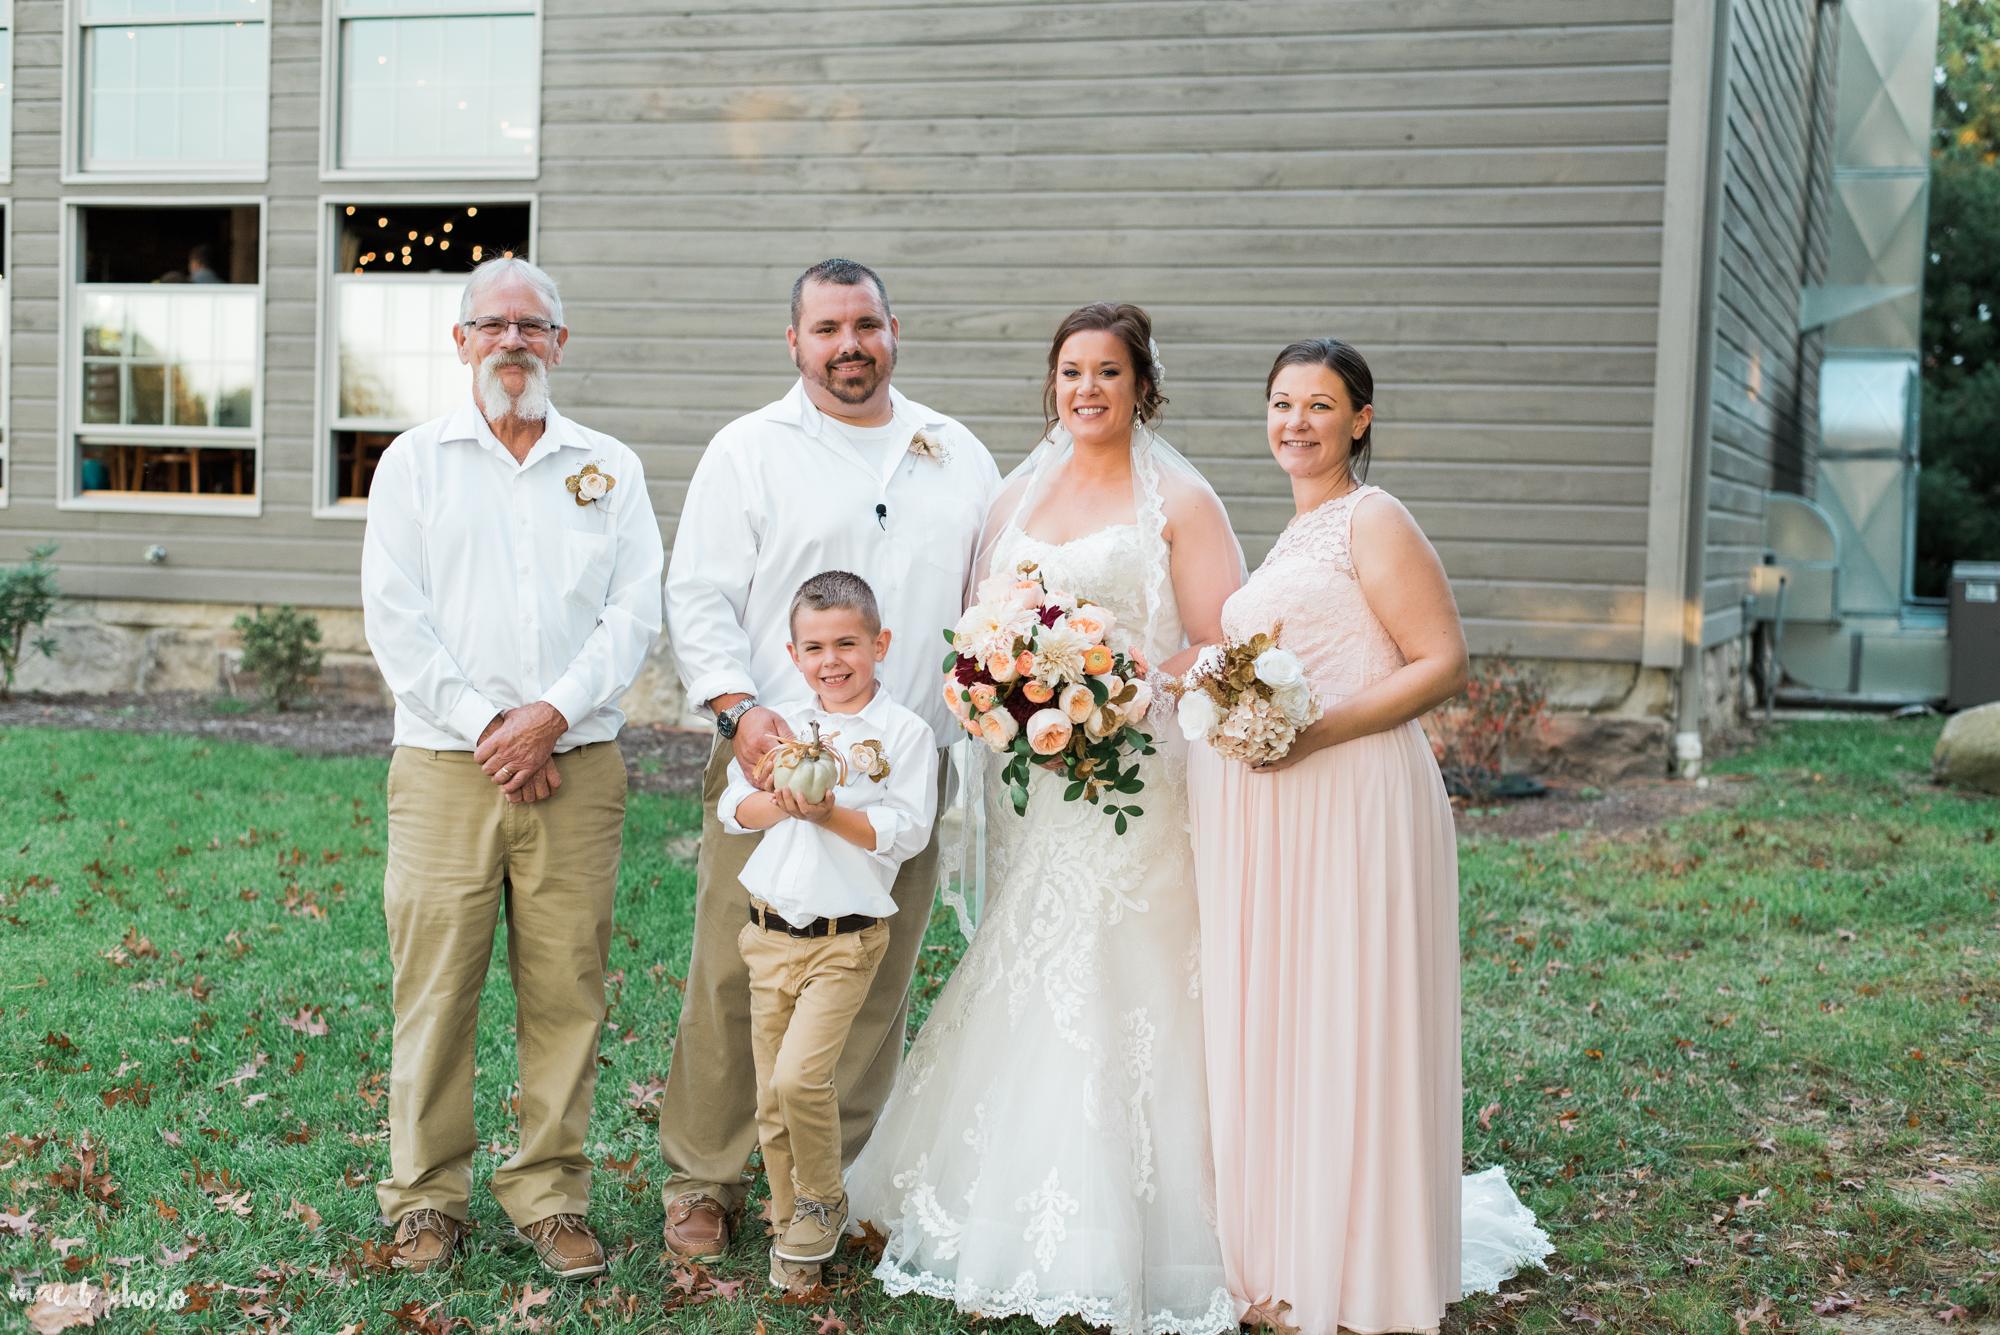 Sarah & Dustin's Rustic Chic Barn Wedding at Hartford Hill Winery in Hartford, Ohio by Mae B Photo-52.jpg